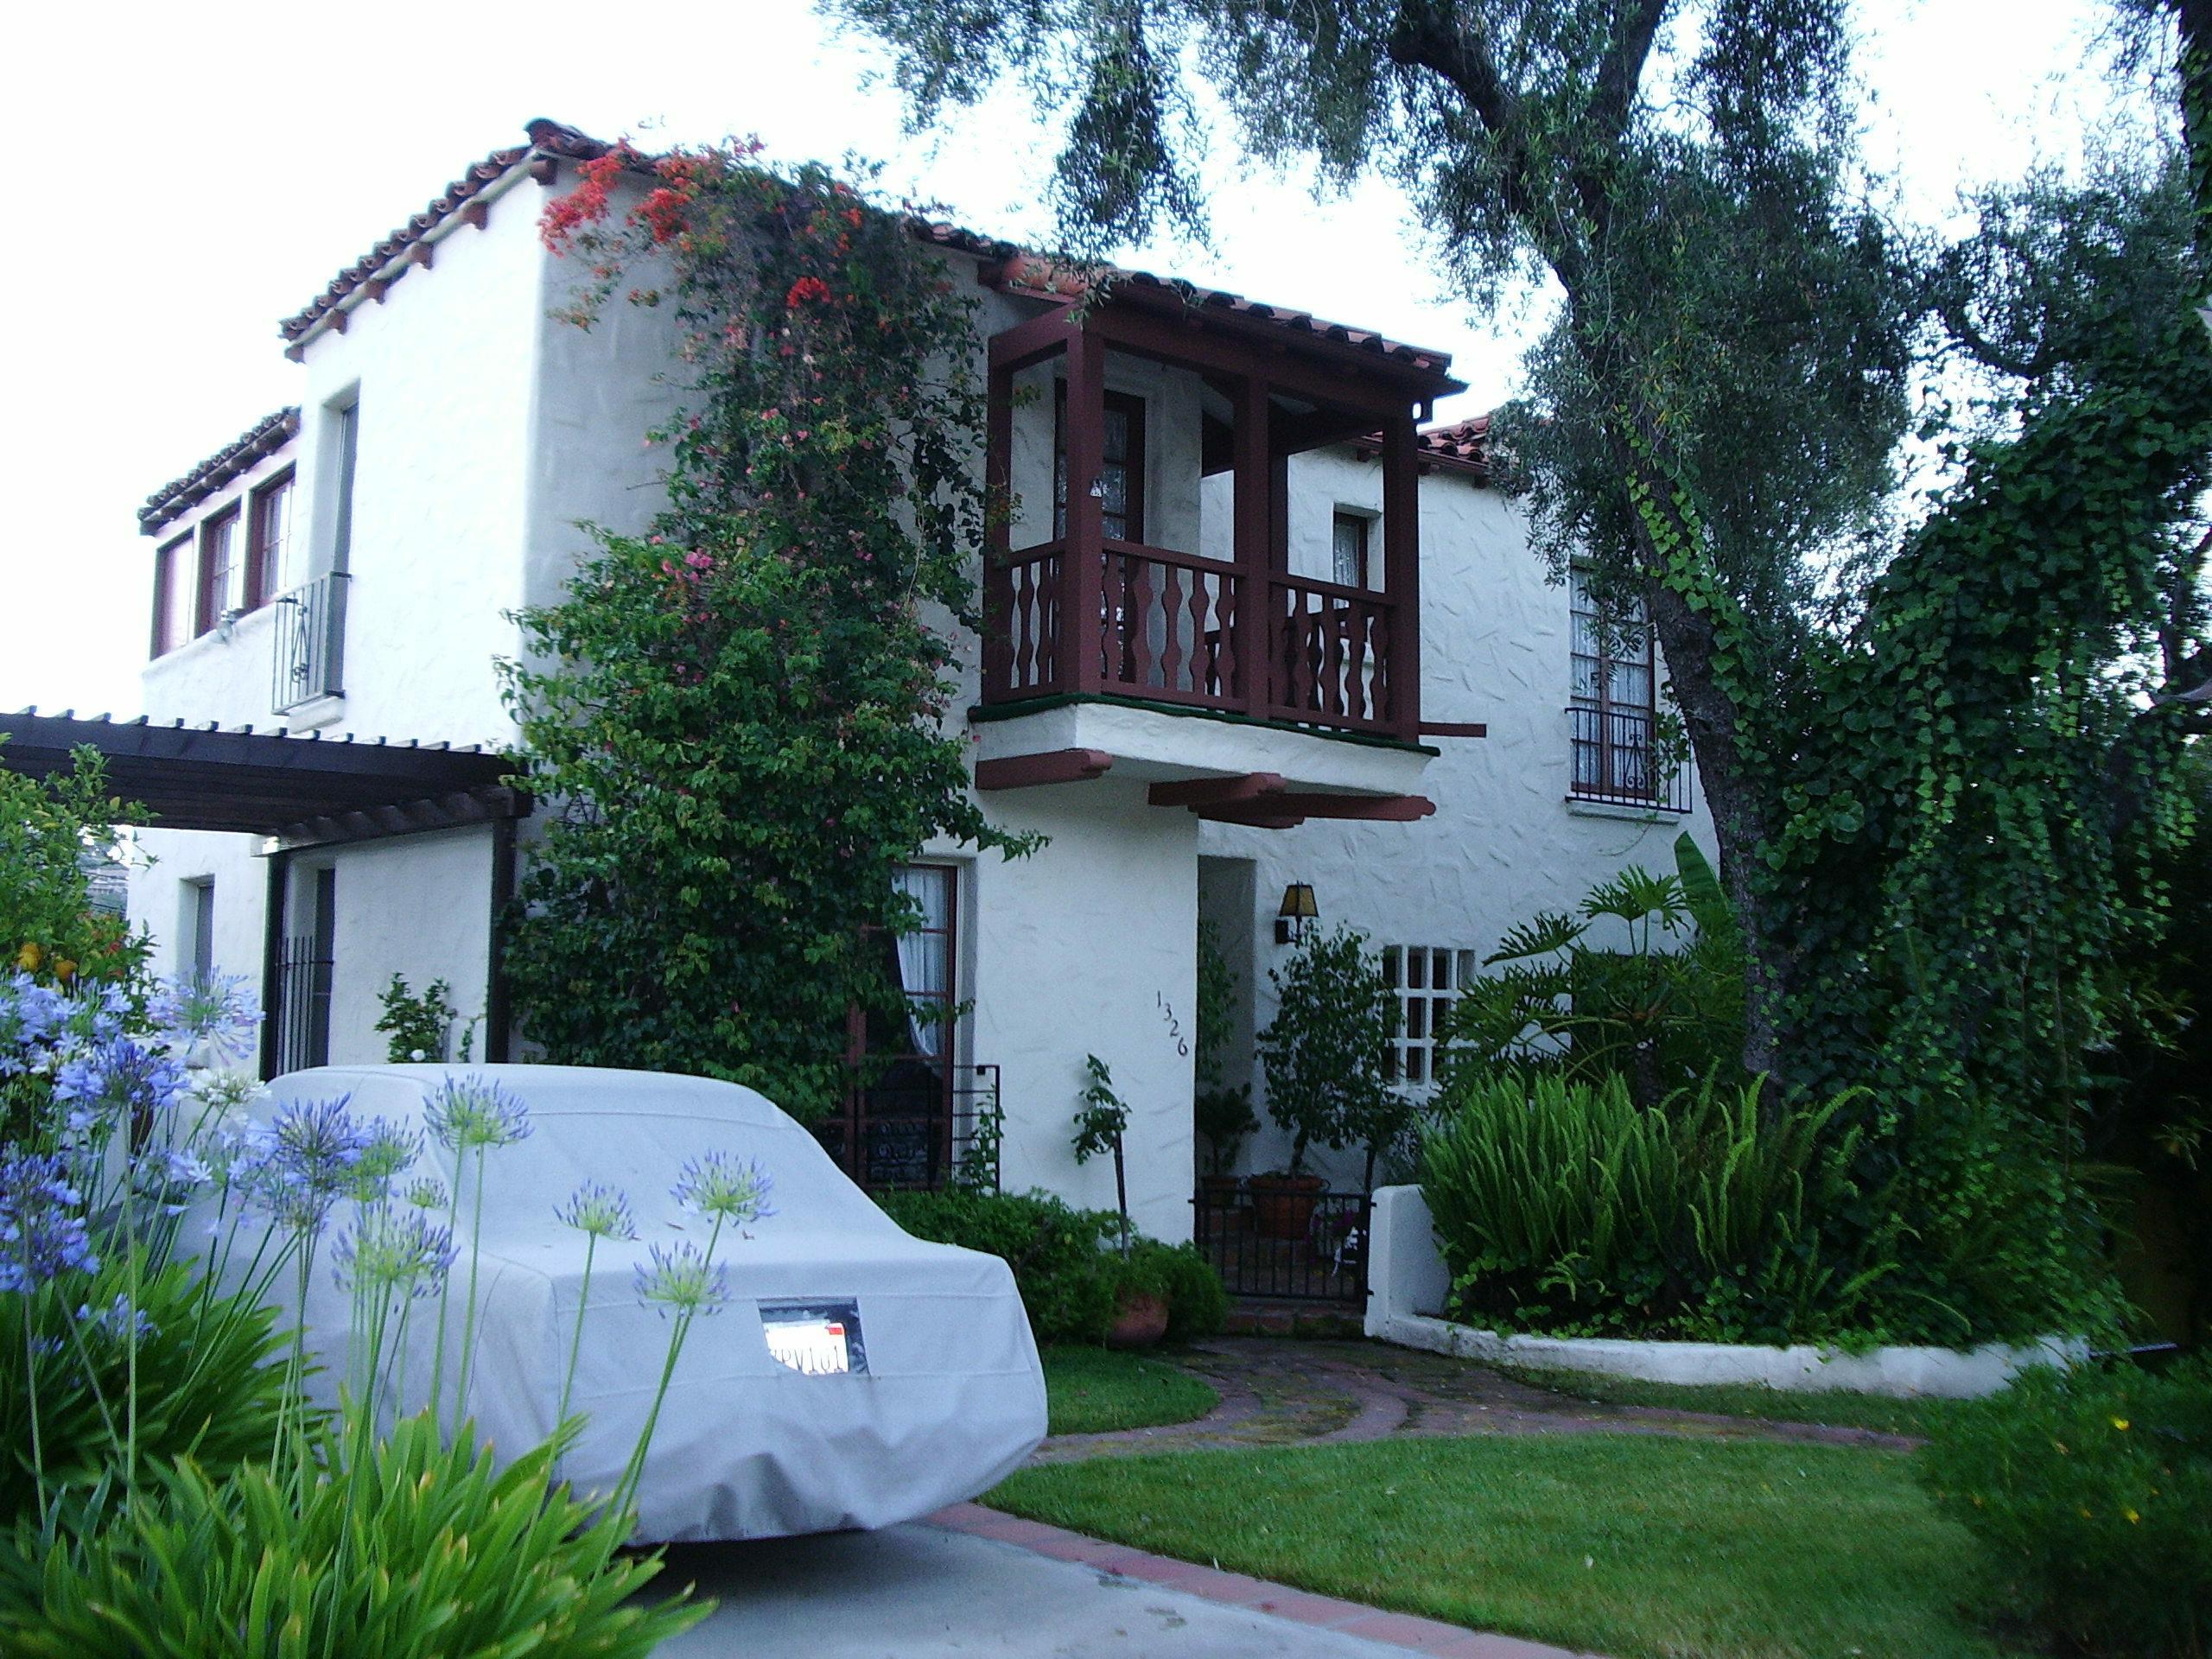 Glendale california familypedia fandom powered by wikia for Glendale house